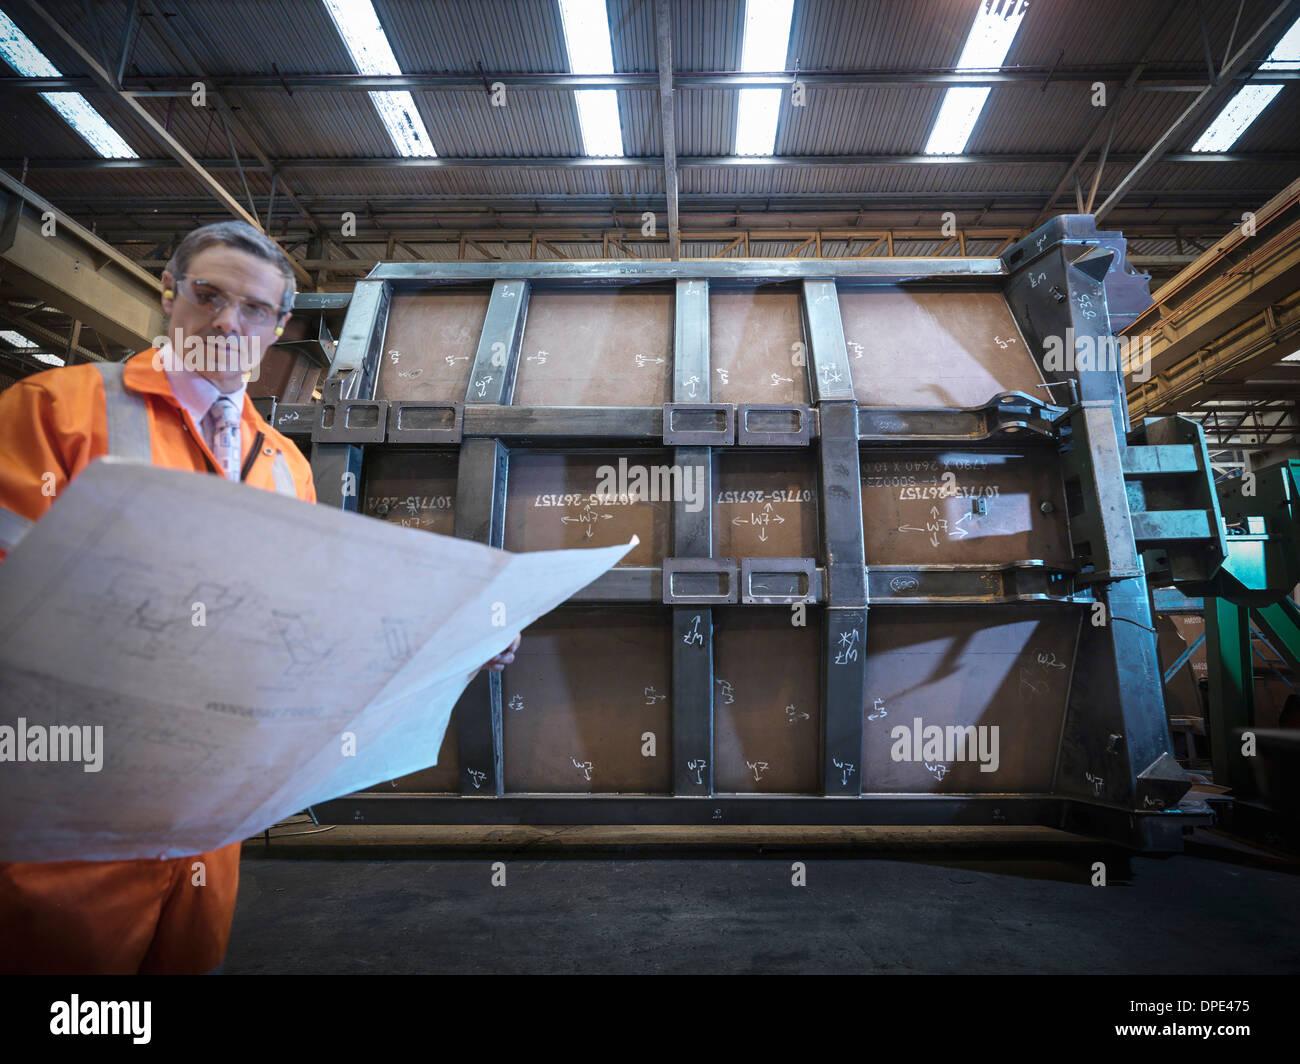 Engineer inspecting engineering drawings in factory - Stock Image